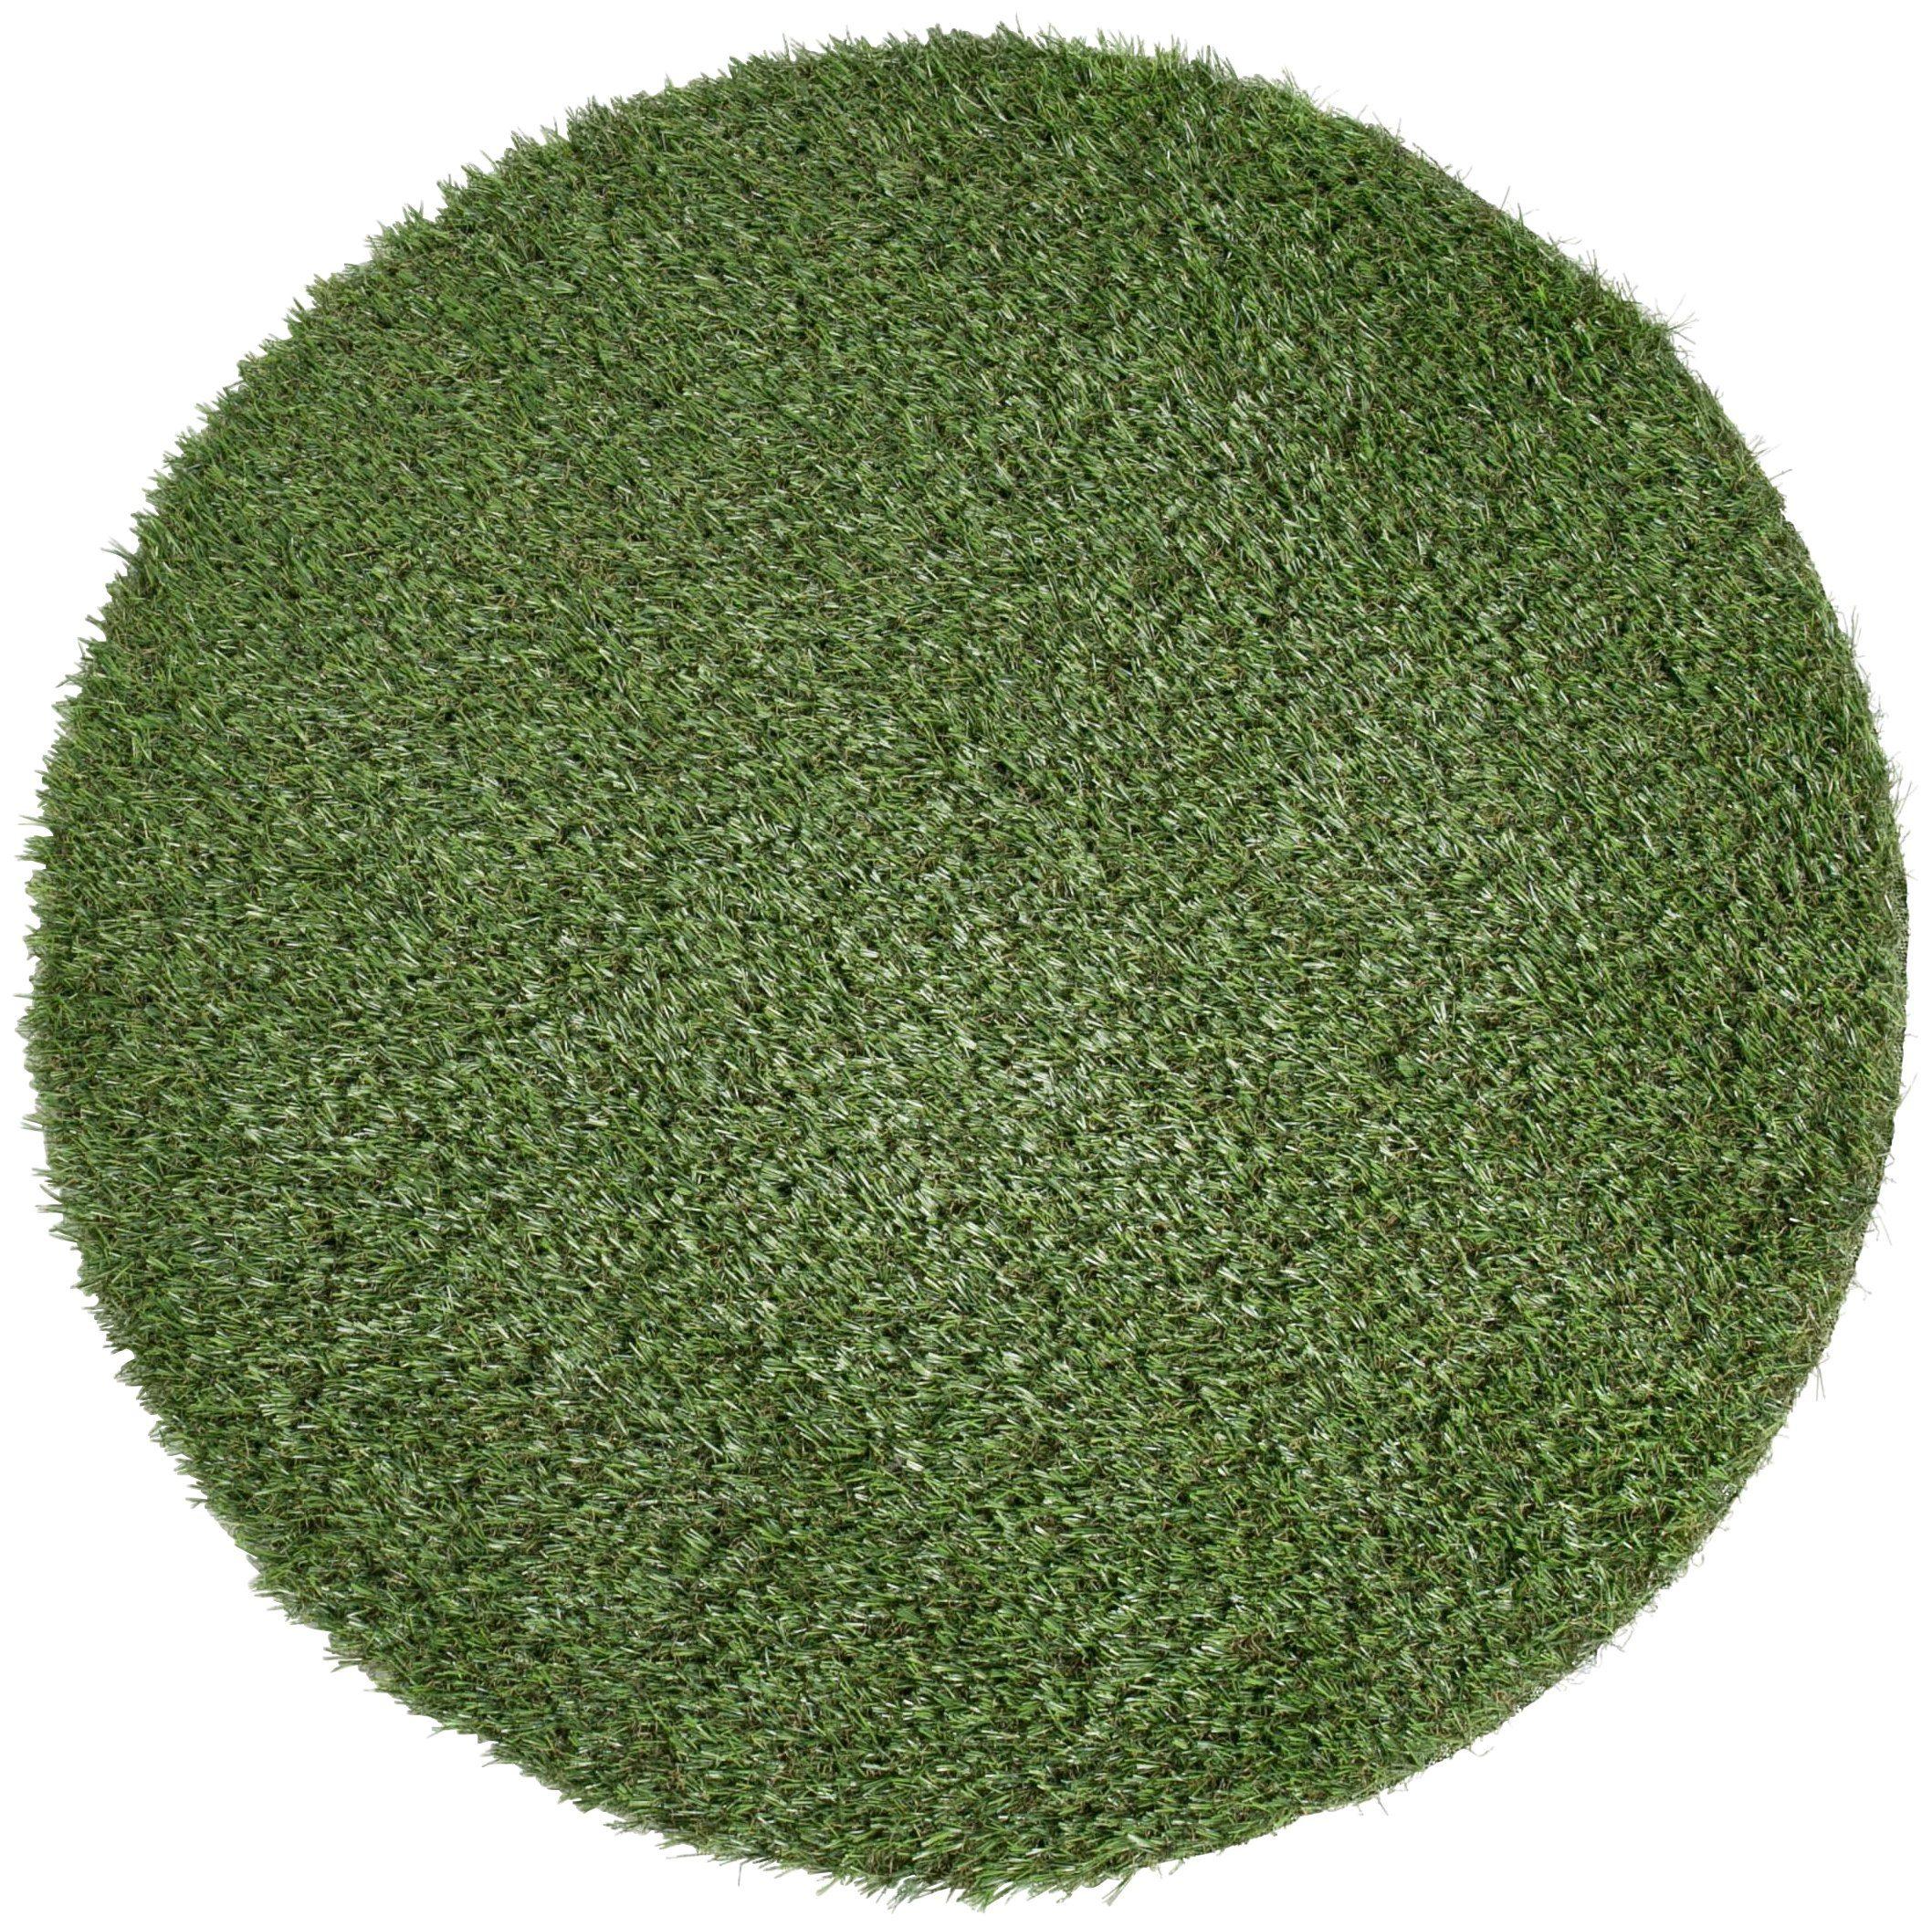 ANDIAMO Kunstrasen »Sansibar«, Ø 100 cm, grün